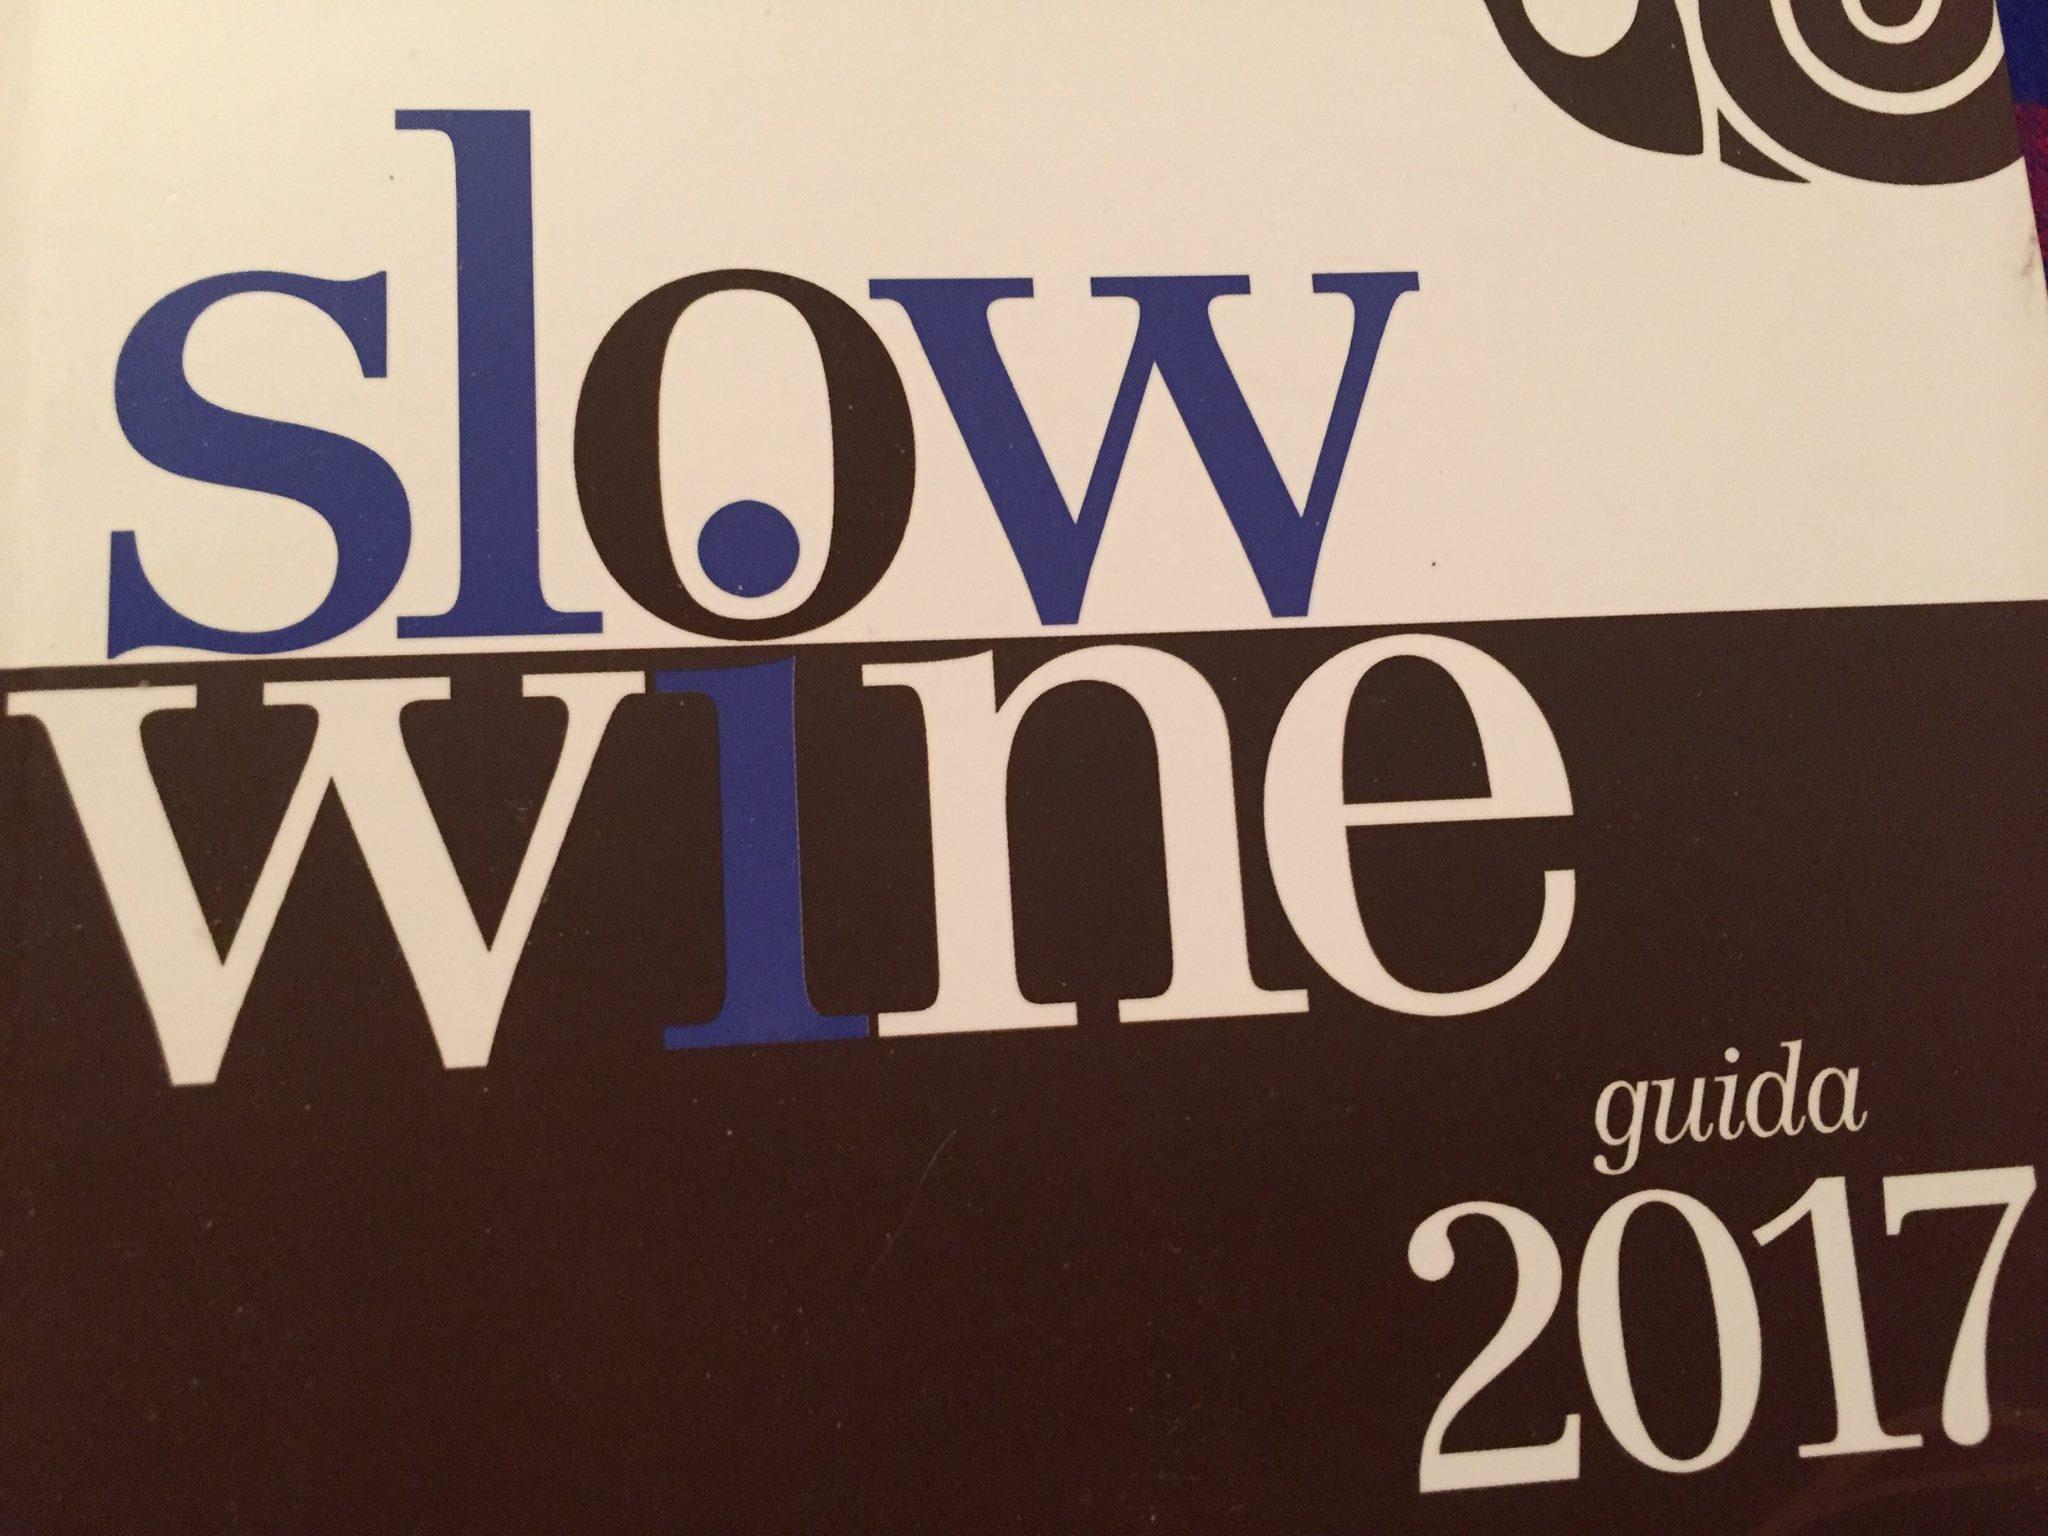 Slow Food Forlì : una cena per Slow Wine